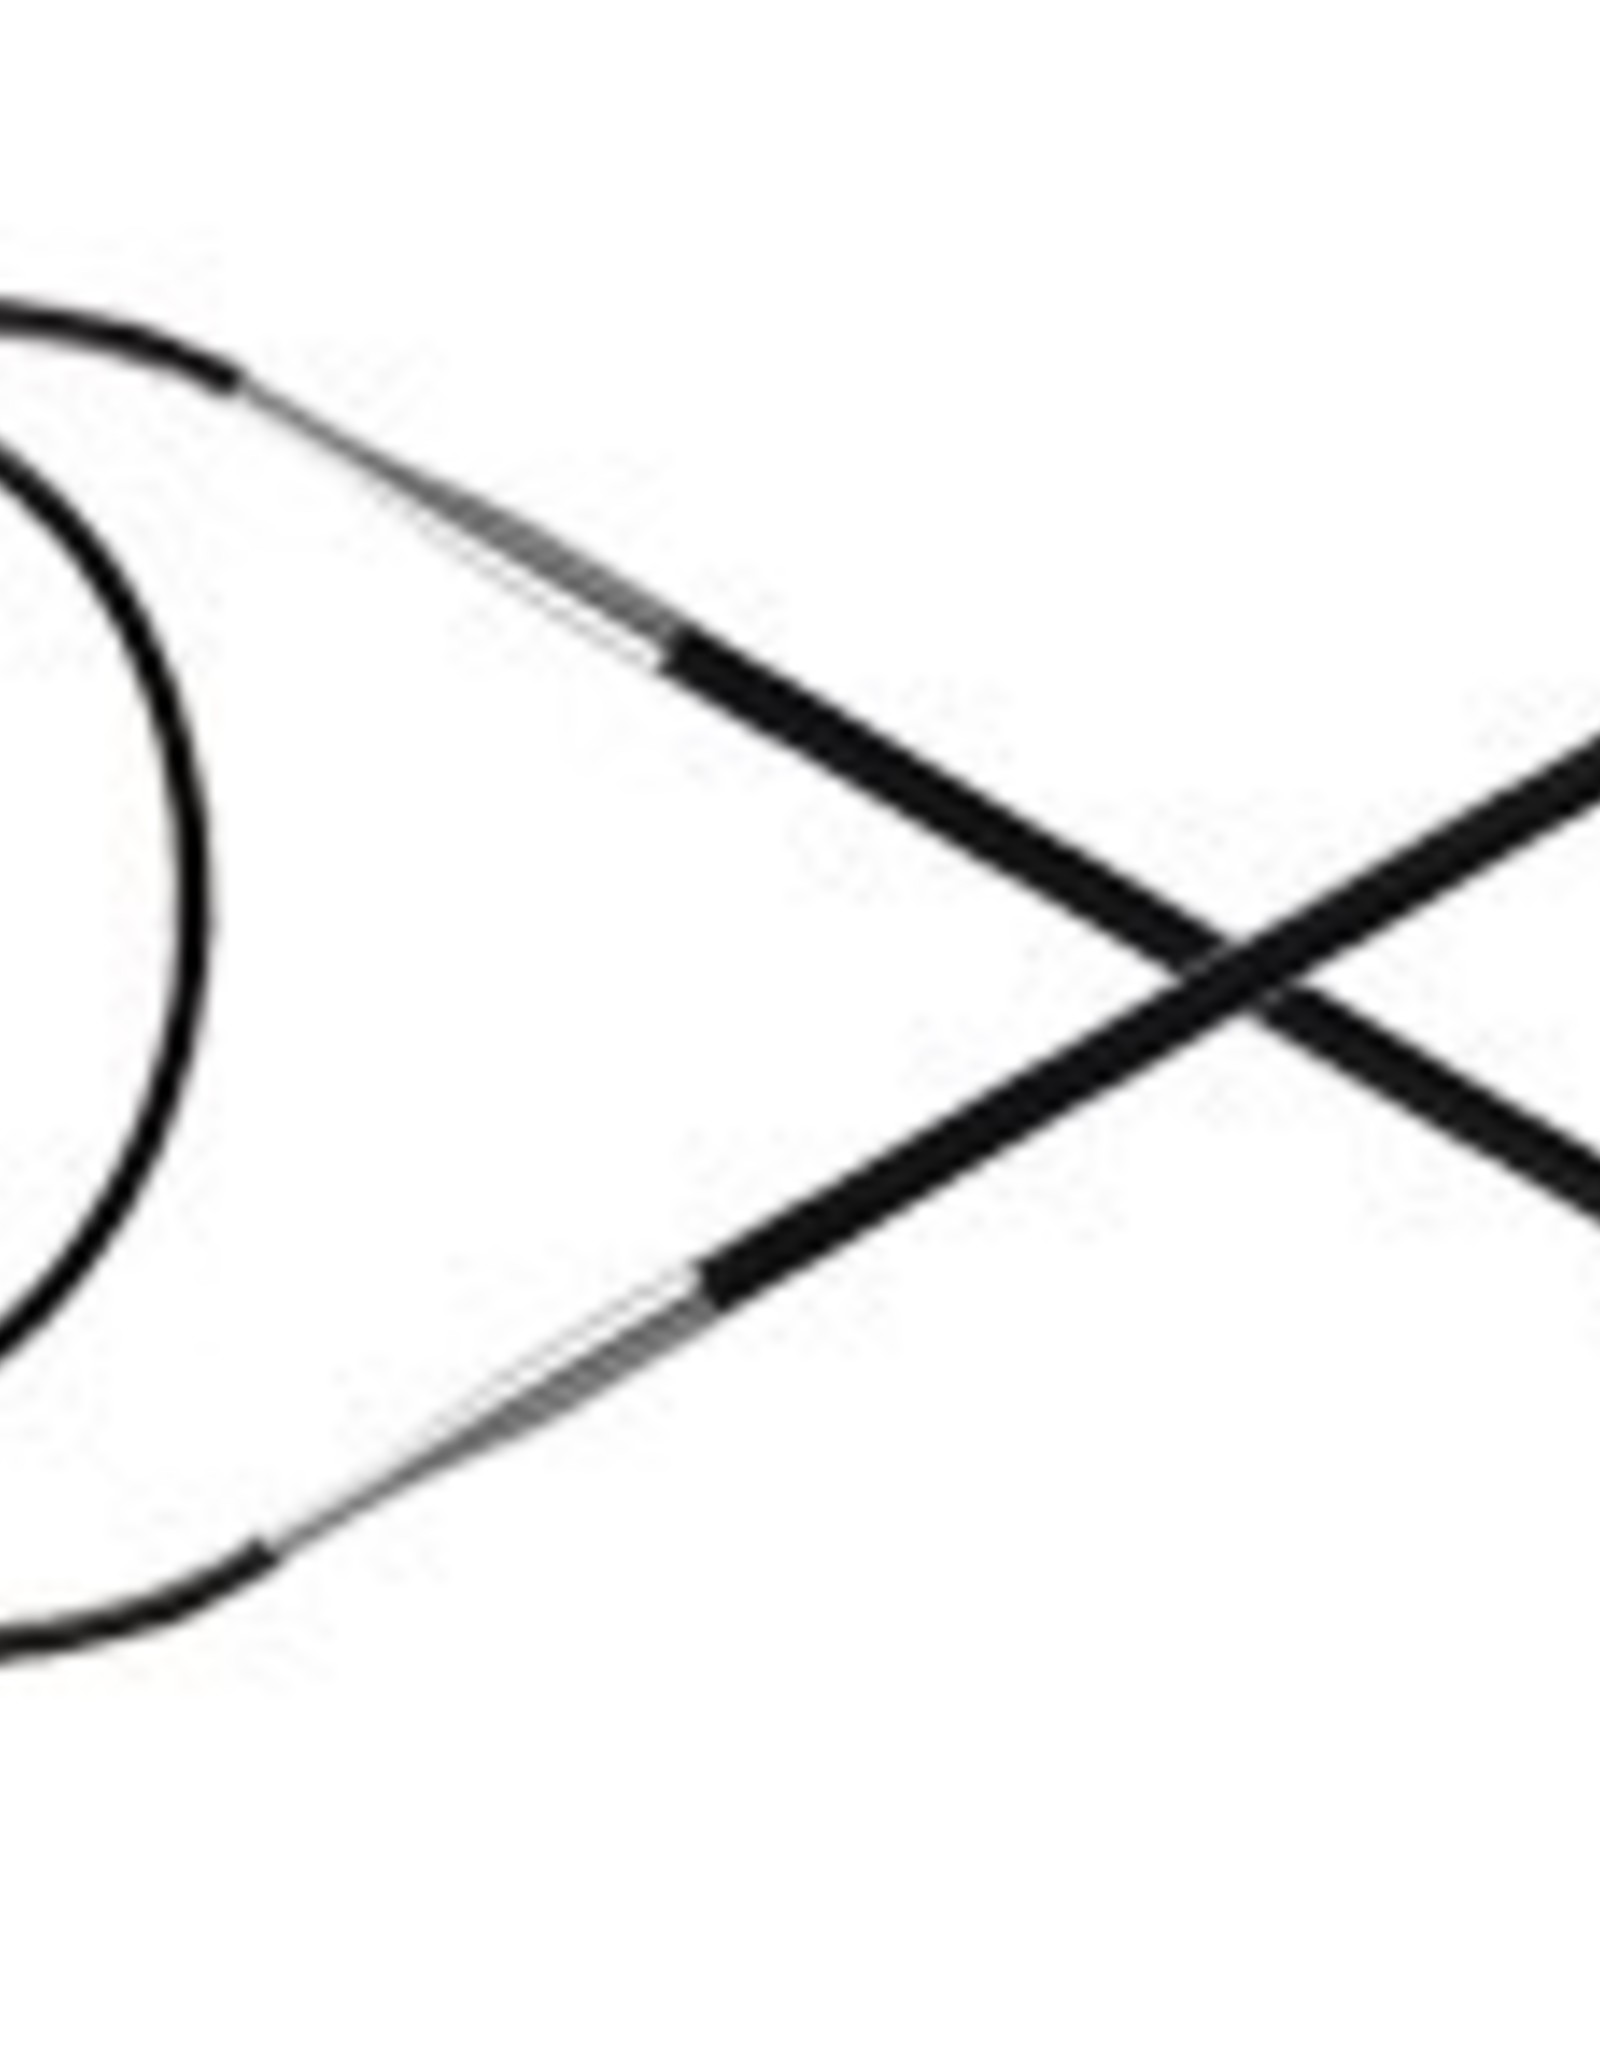 Knitter's Pride 4 Karbonz Circular 32